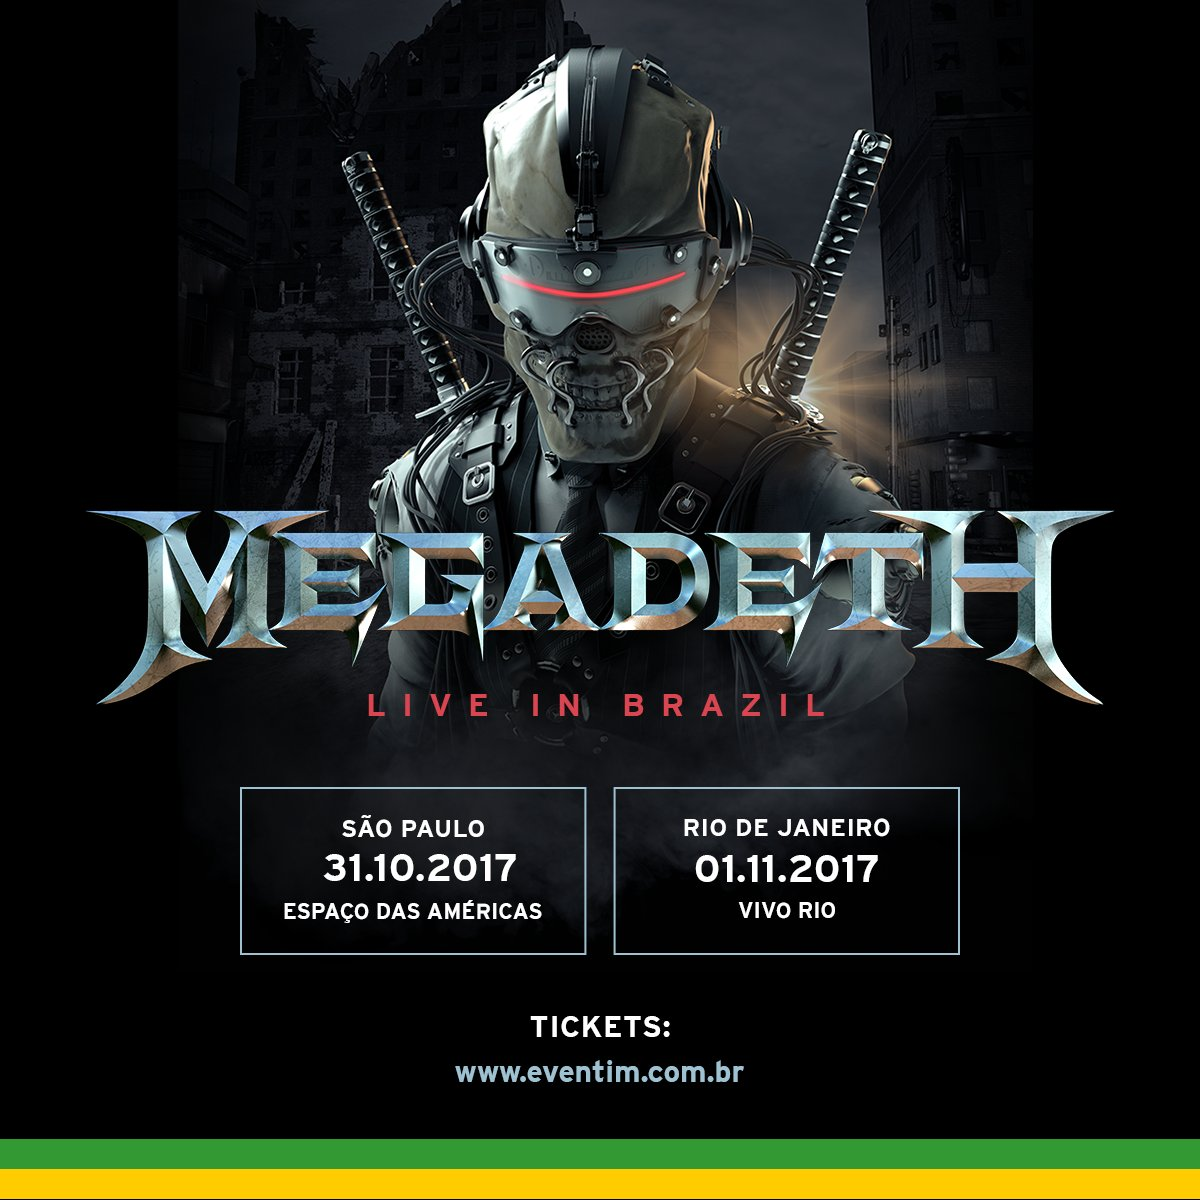 VIP Meet & Greet + Side Stage Packages available for Sao Paulo 31/10 & Rio De Janeiro 1/11. Compre já o seu!  https://t.co/vO15zOHKGL#Brazil